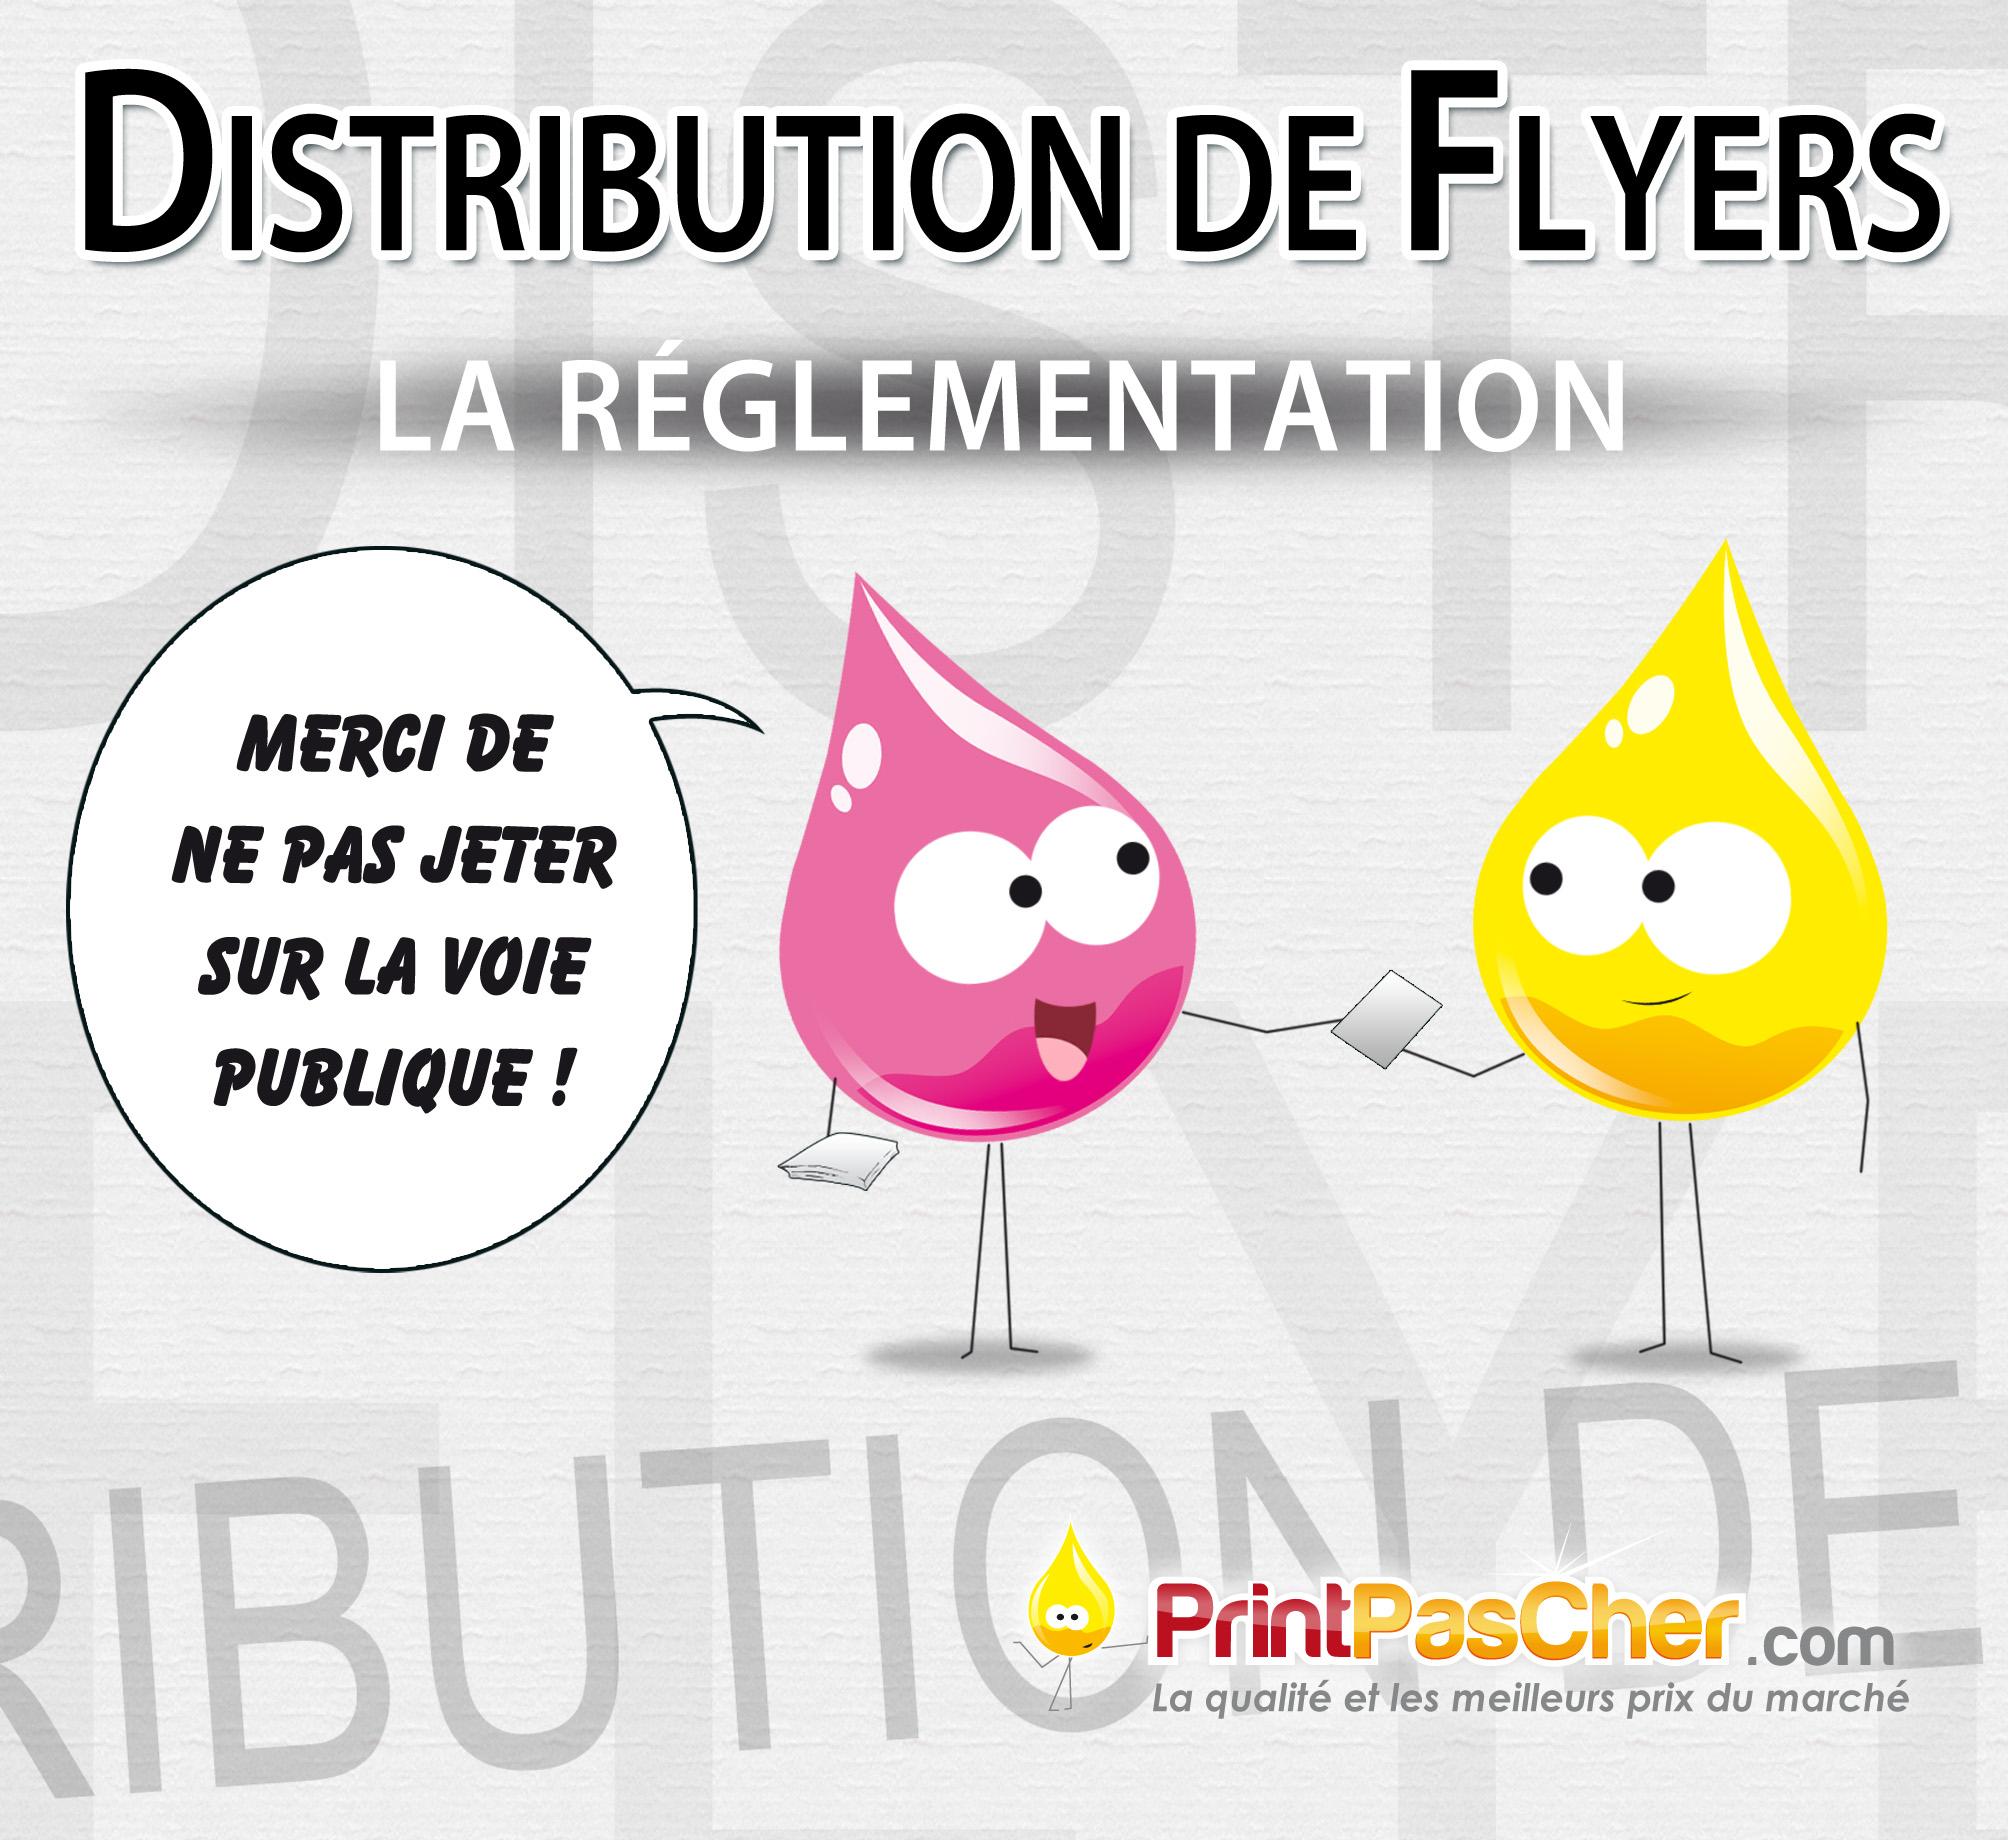 flyers reglementation